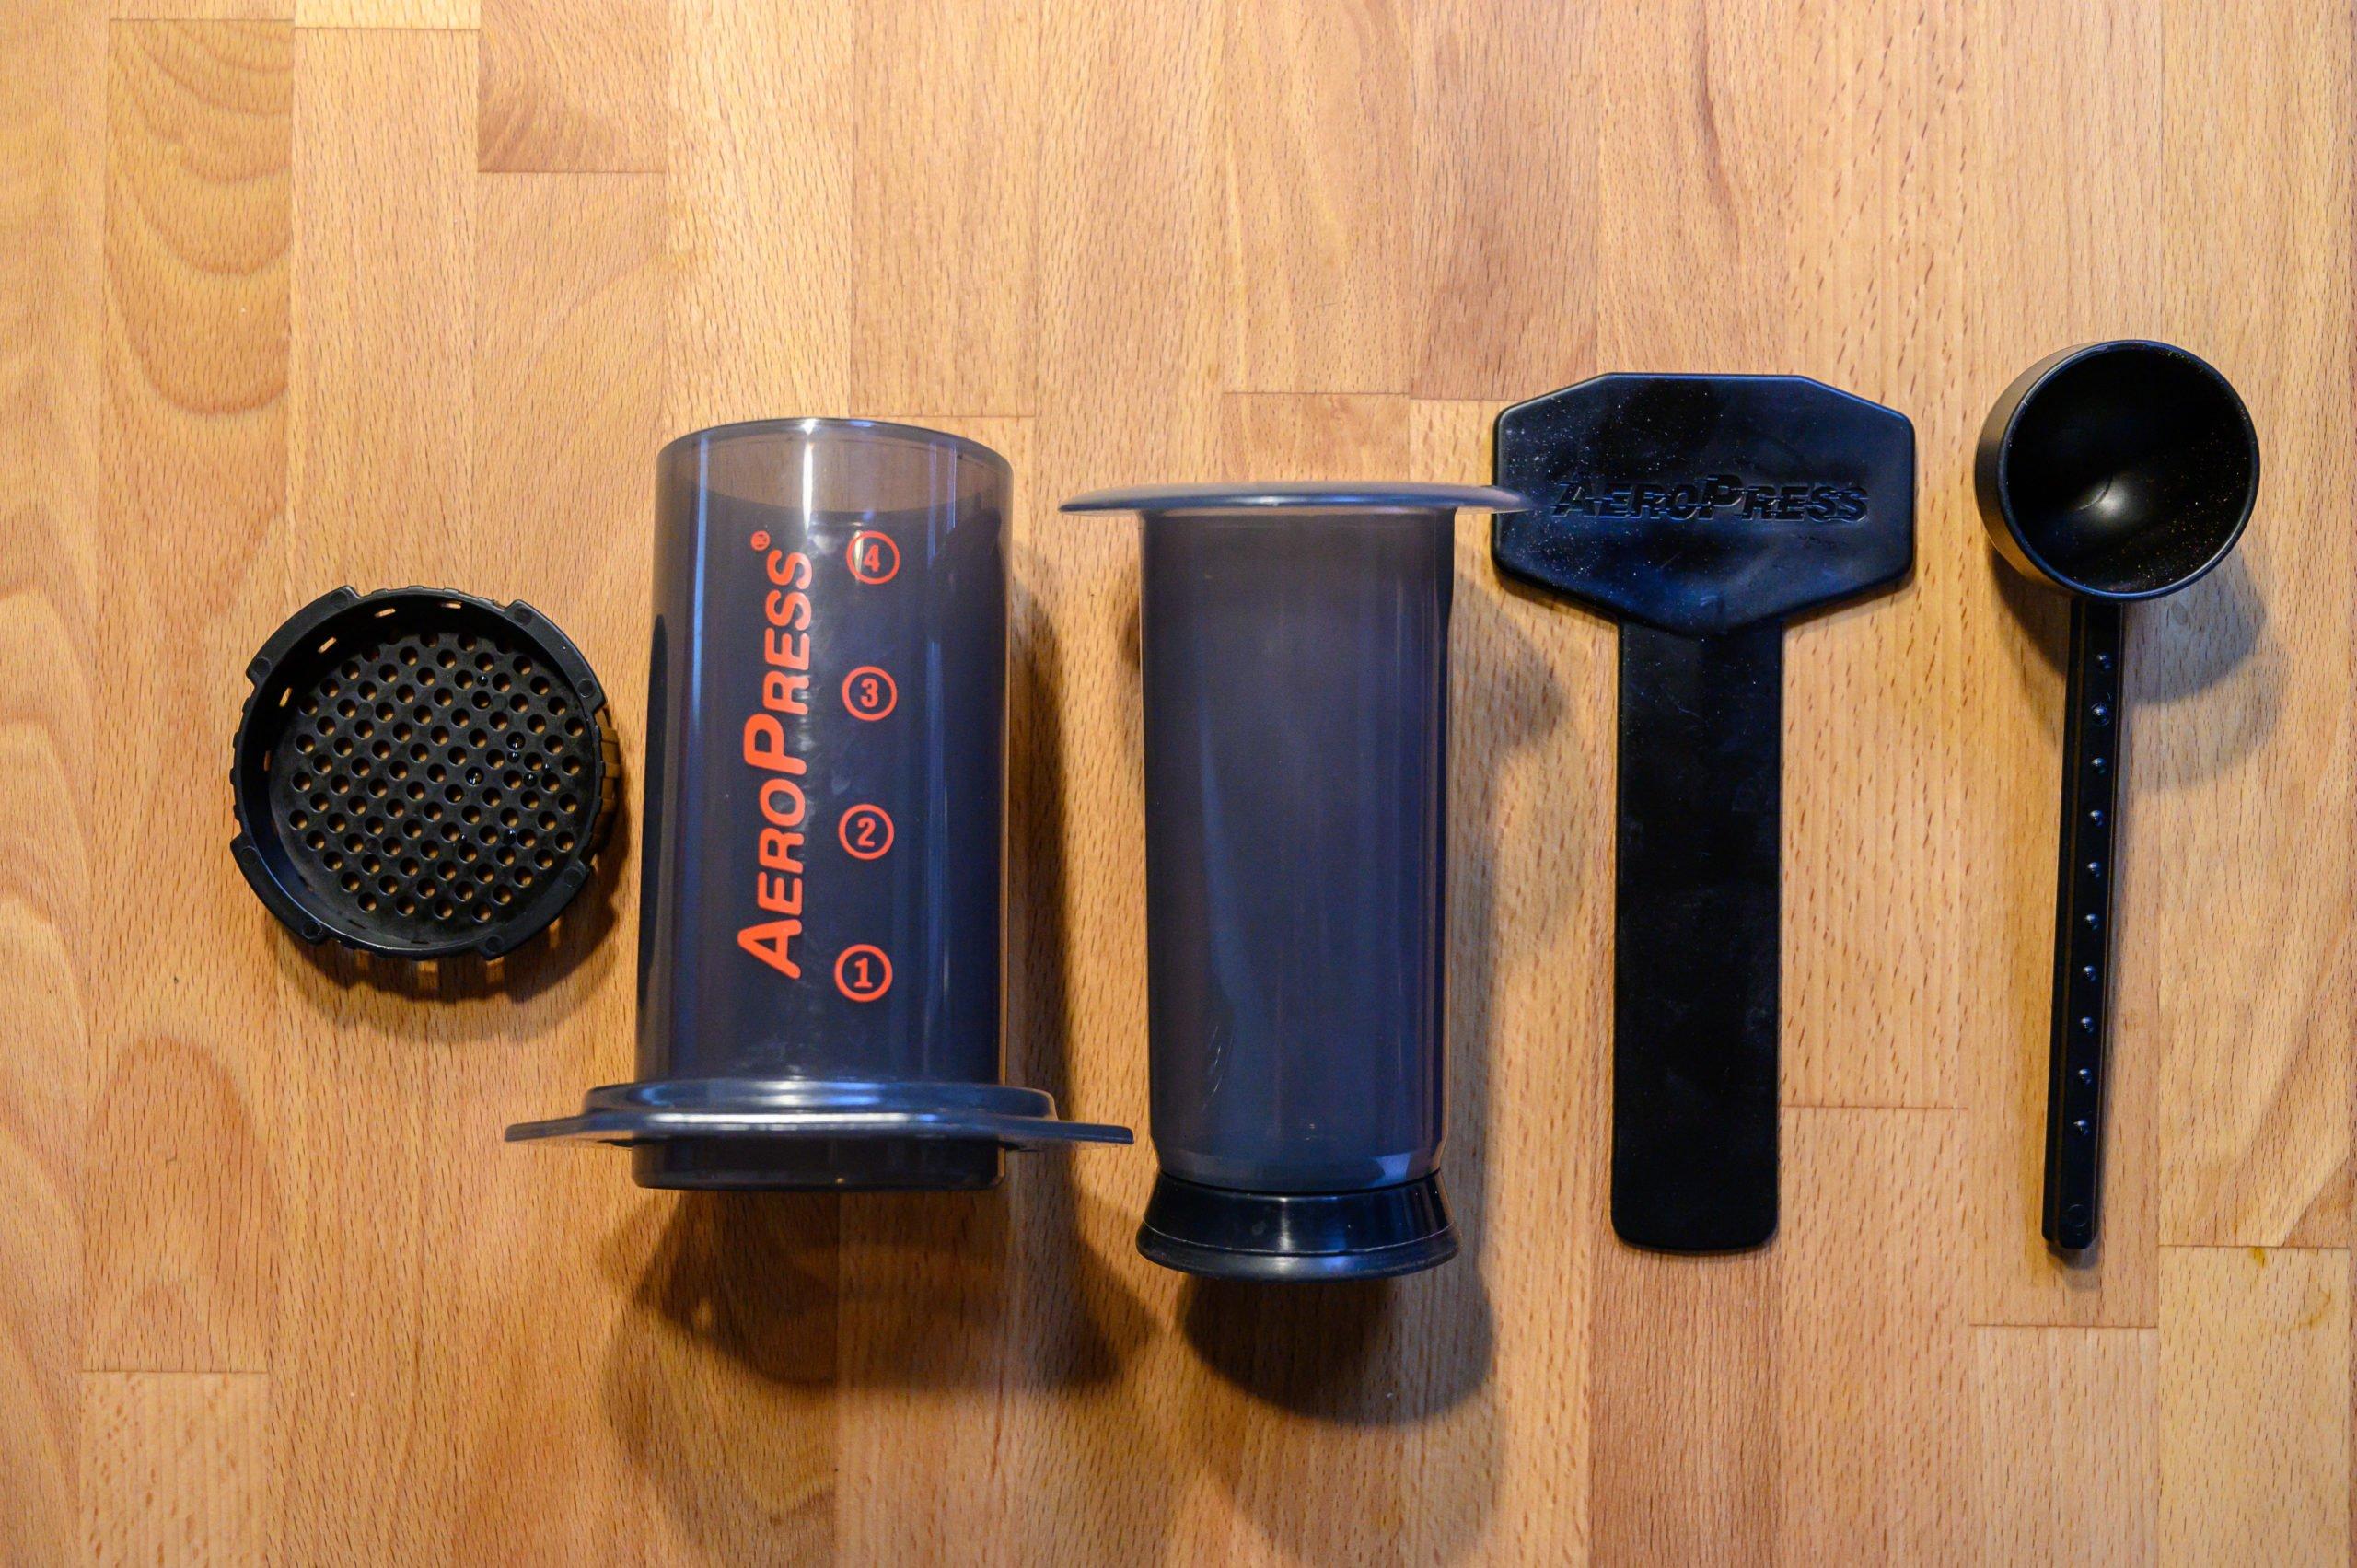 Aeropress coffee maker parts